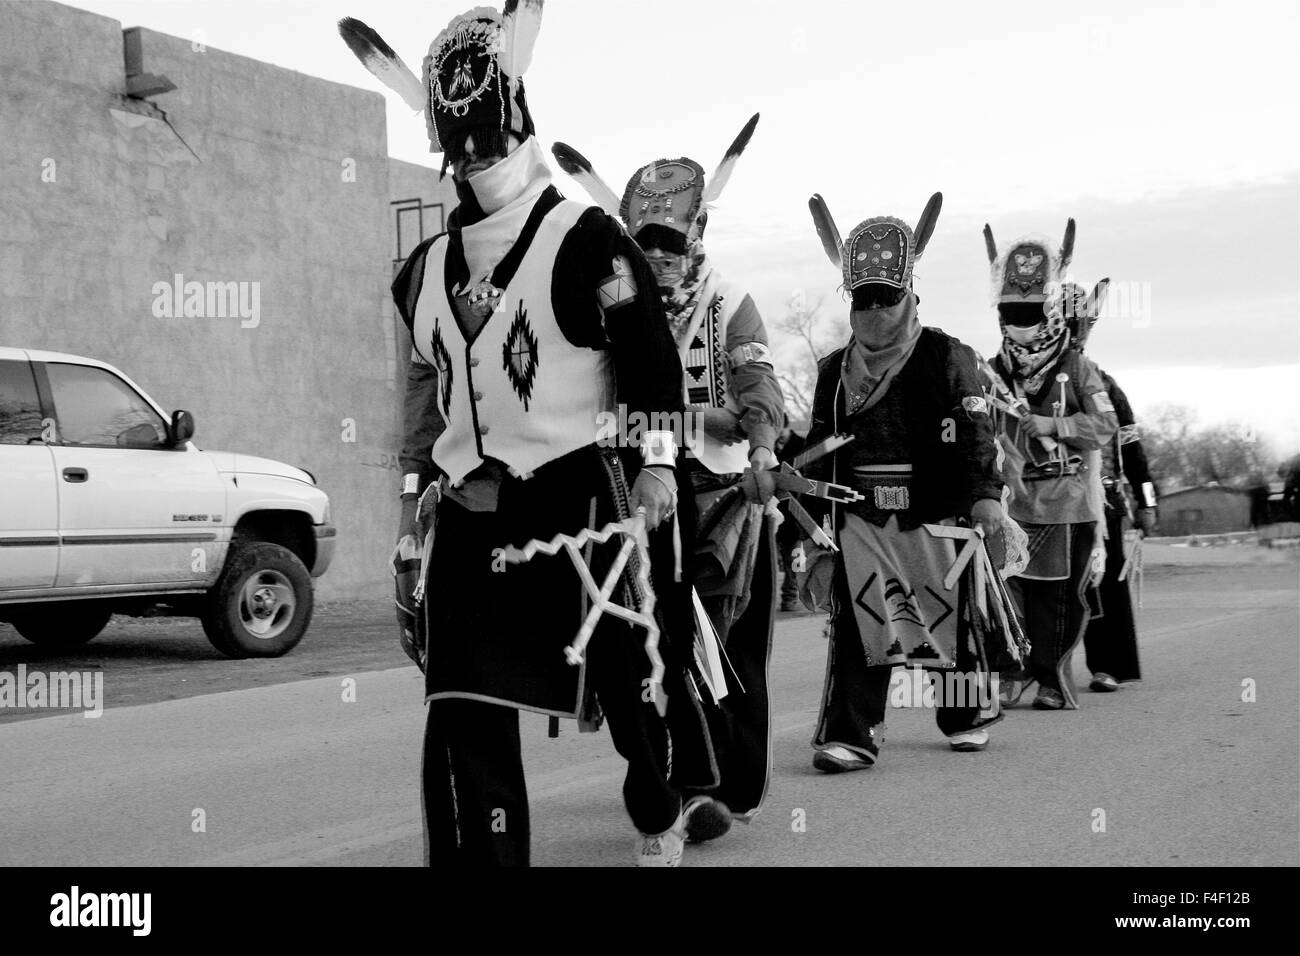 Ohkay Owingeh Christmas Dances 2020 Ohkay Owingeh Pueblo, New Mexico. Matachine dancers, Christmas eve